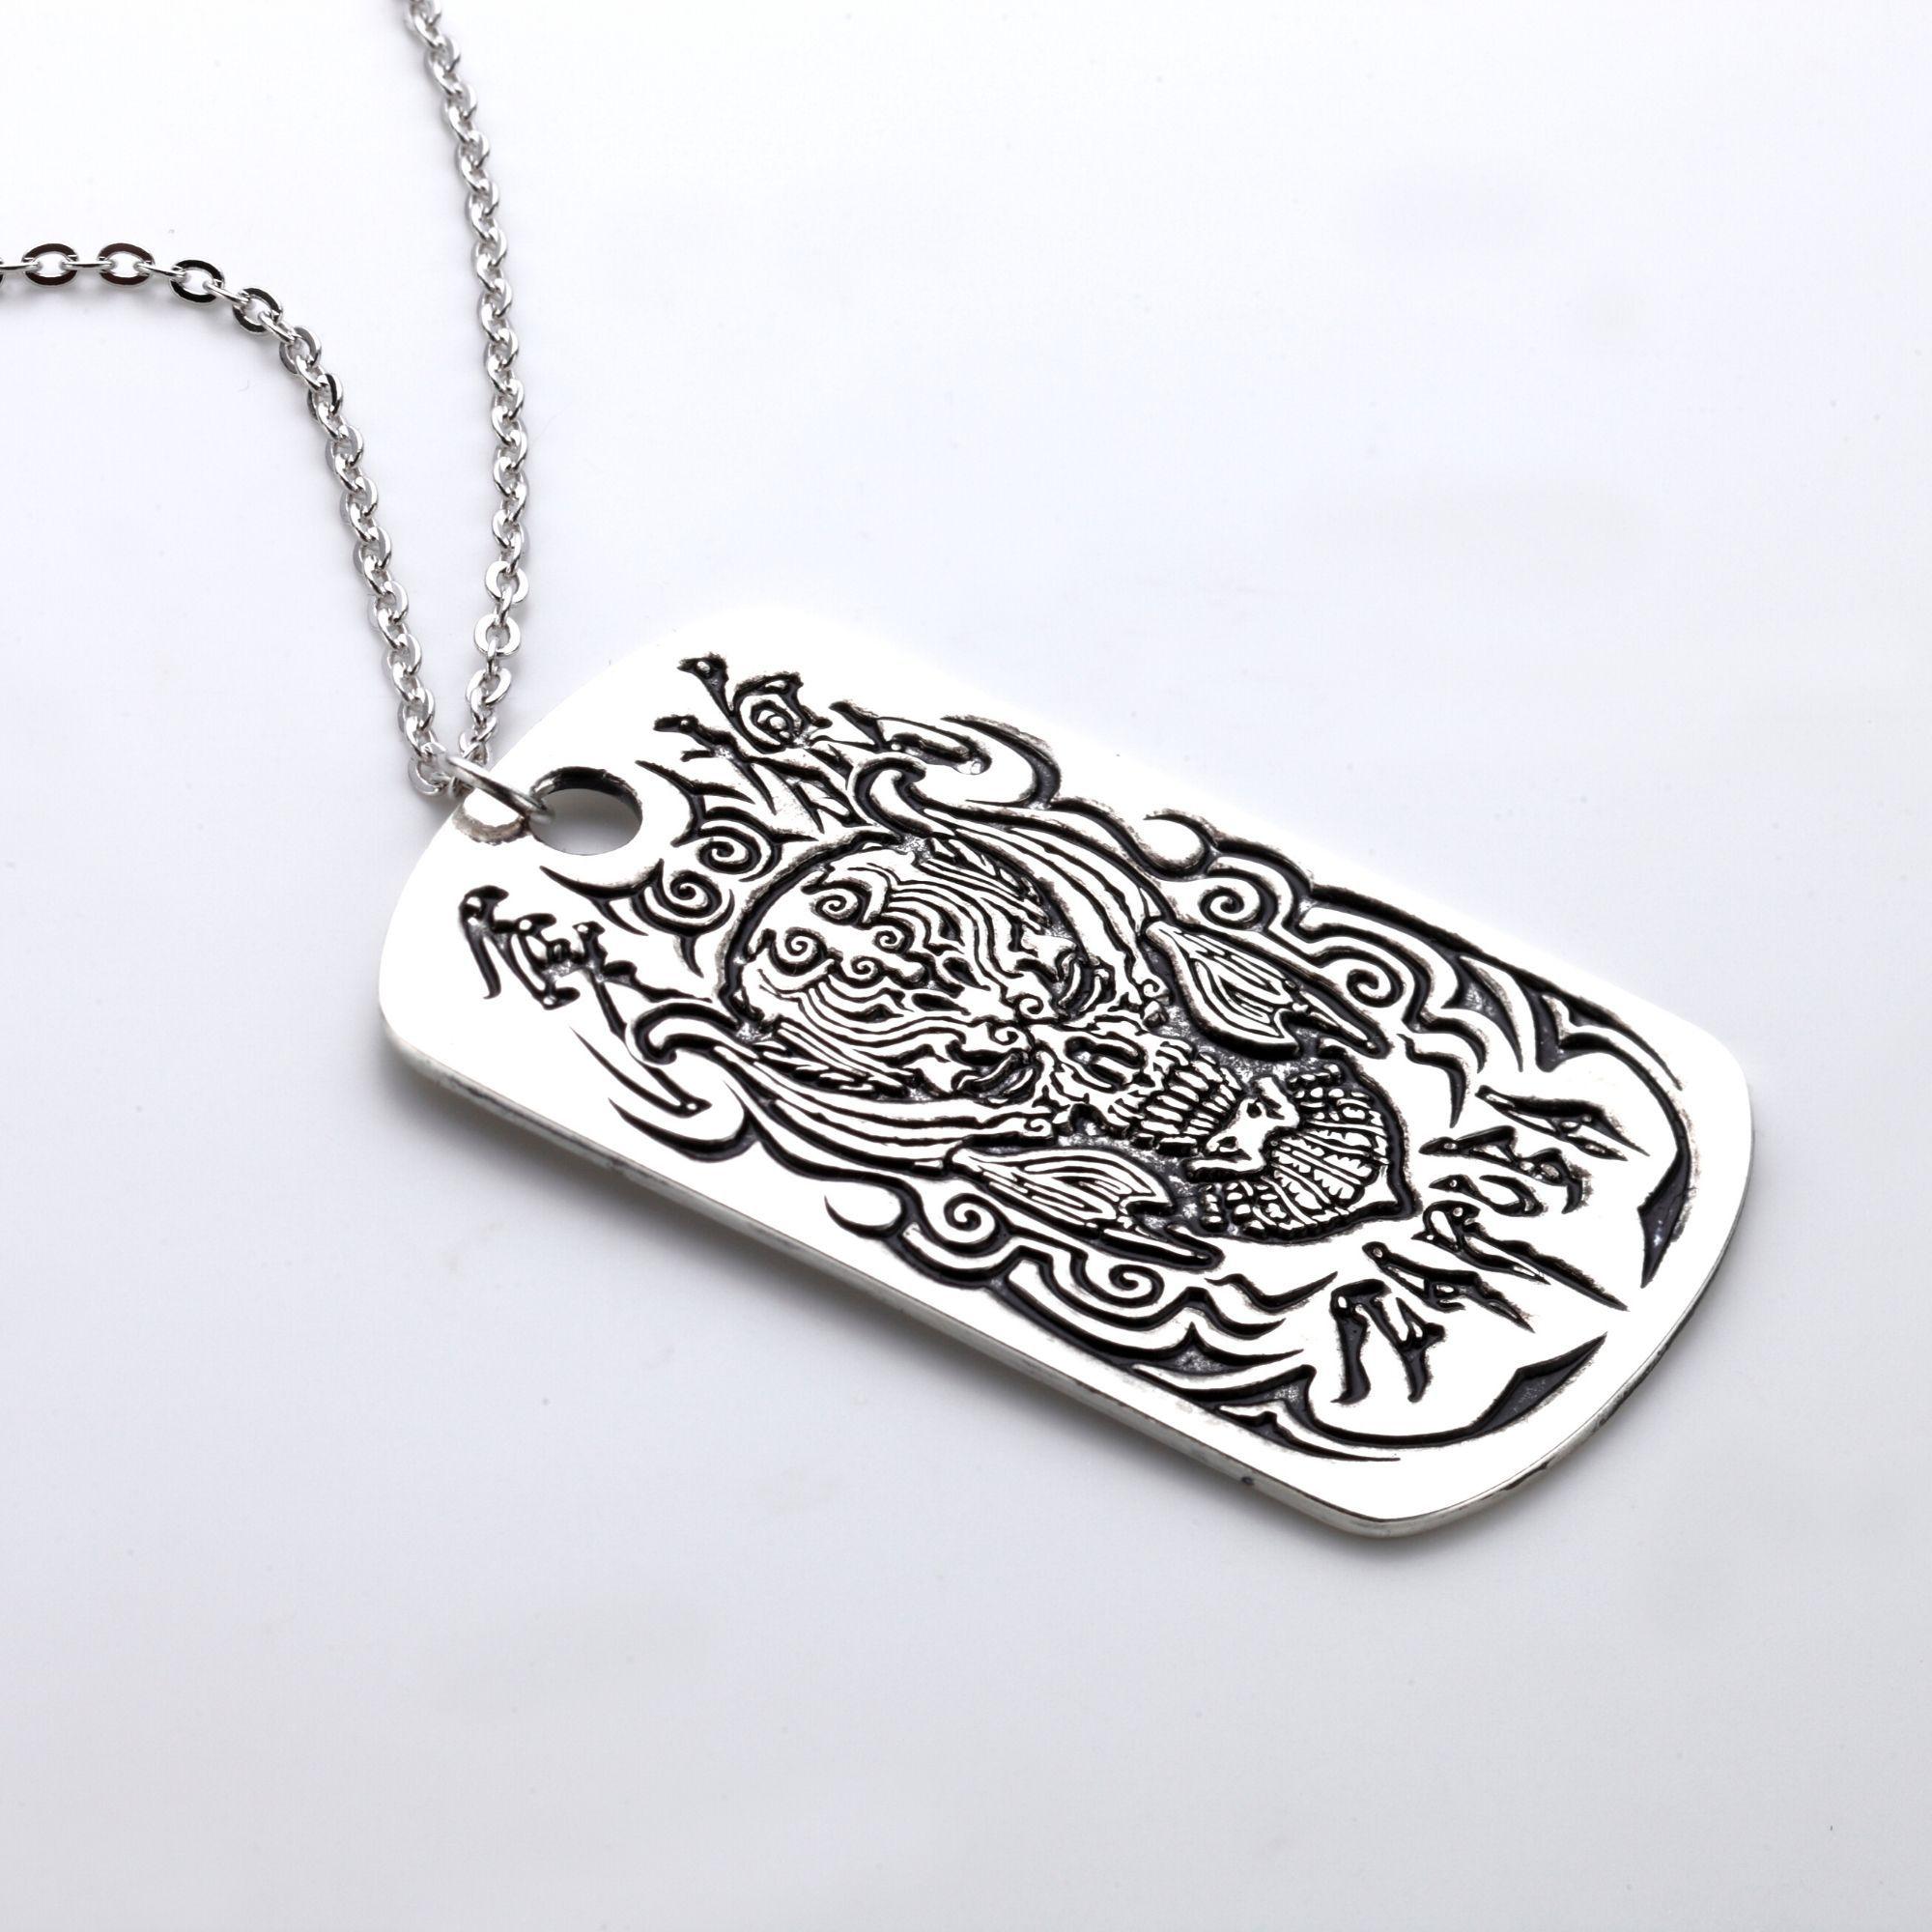 Zaruba Dog Tag Pendant Necklace—GARO